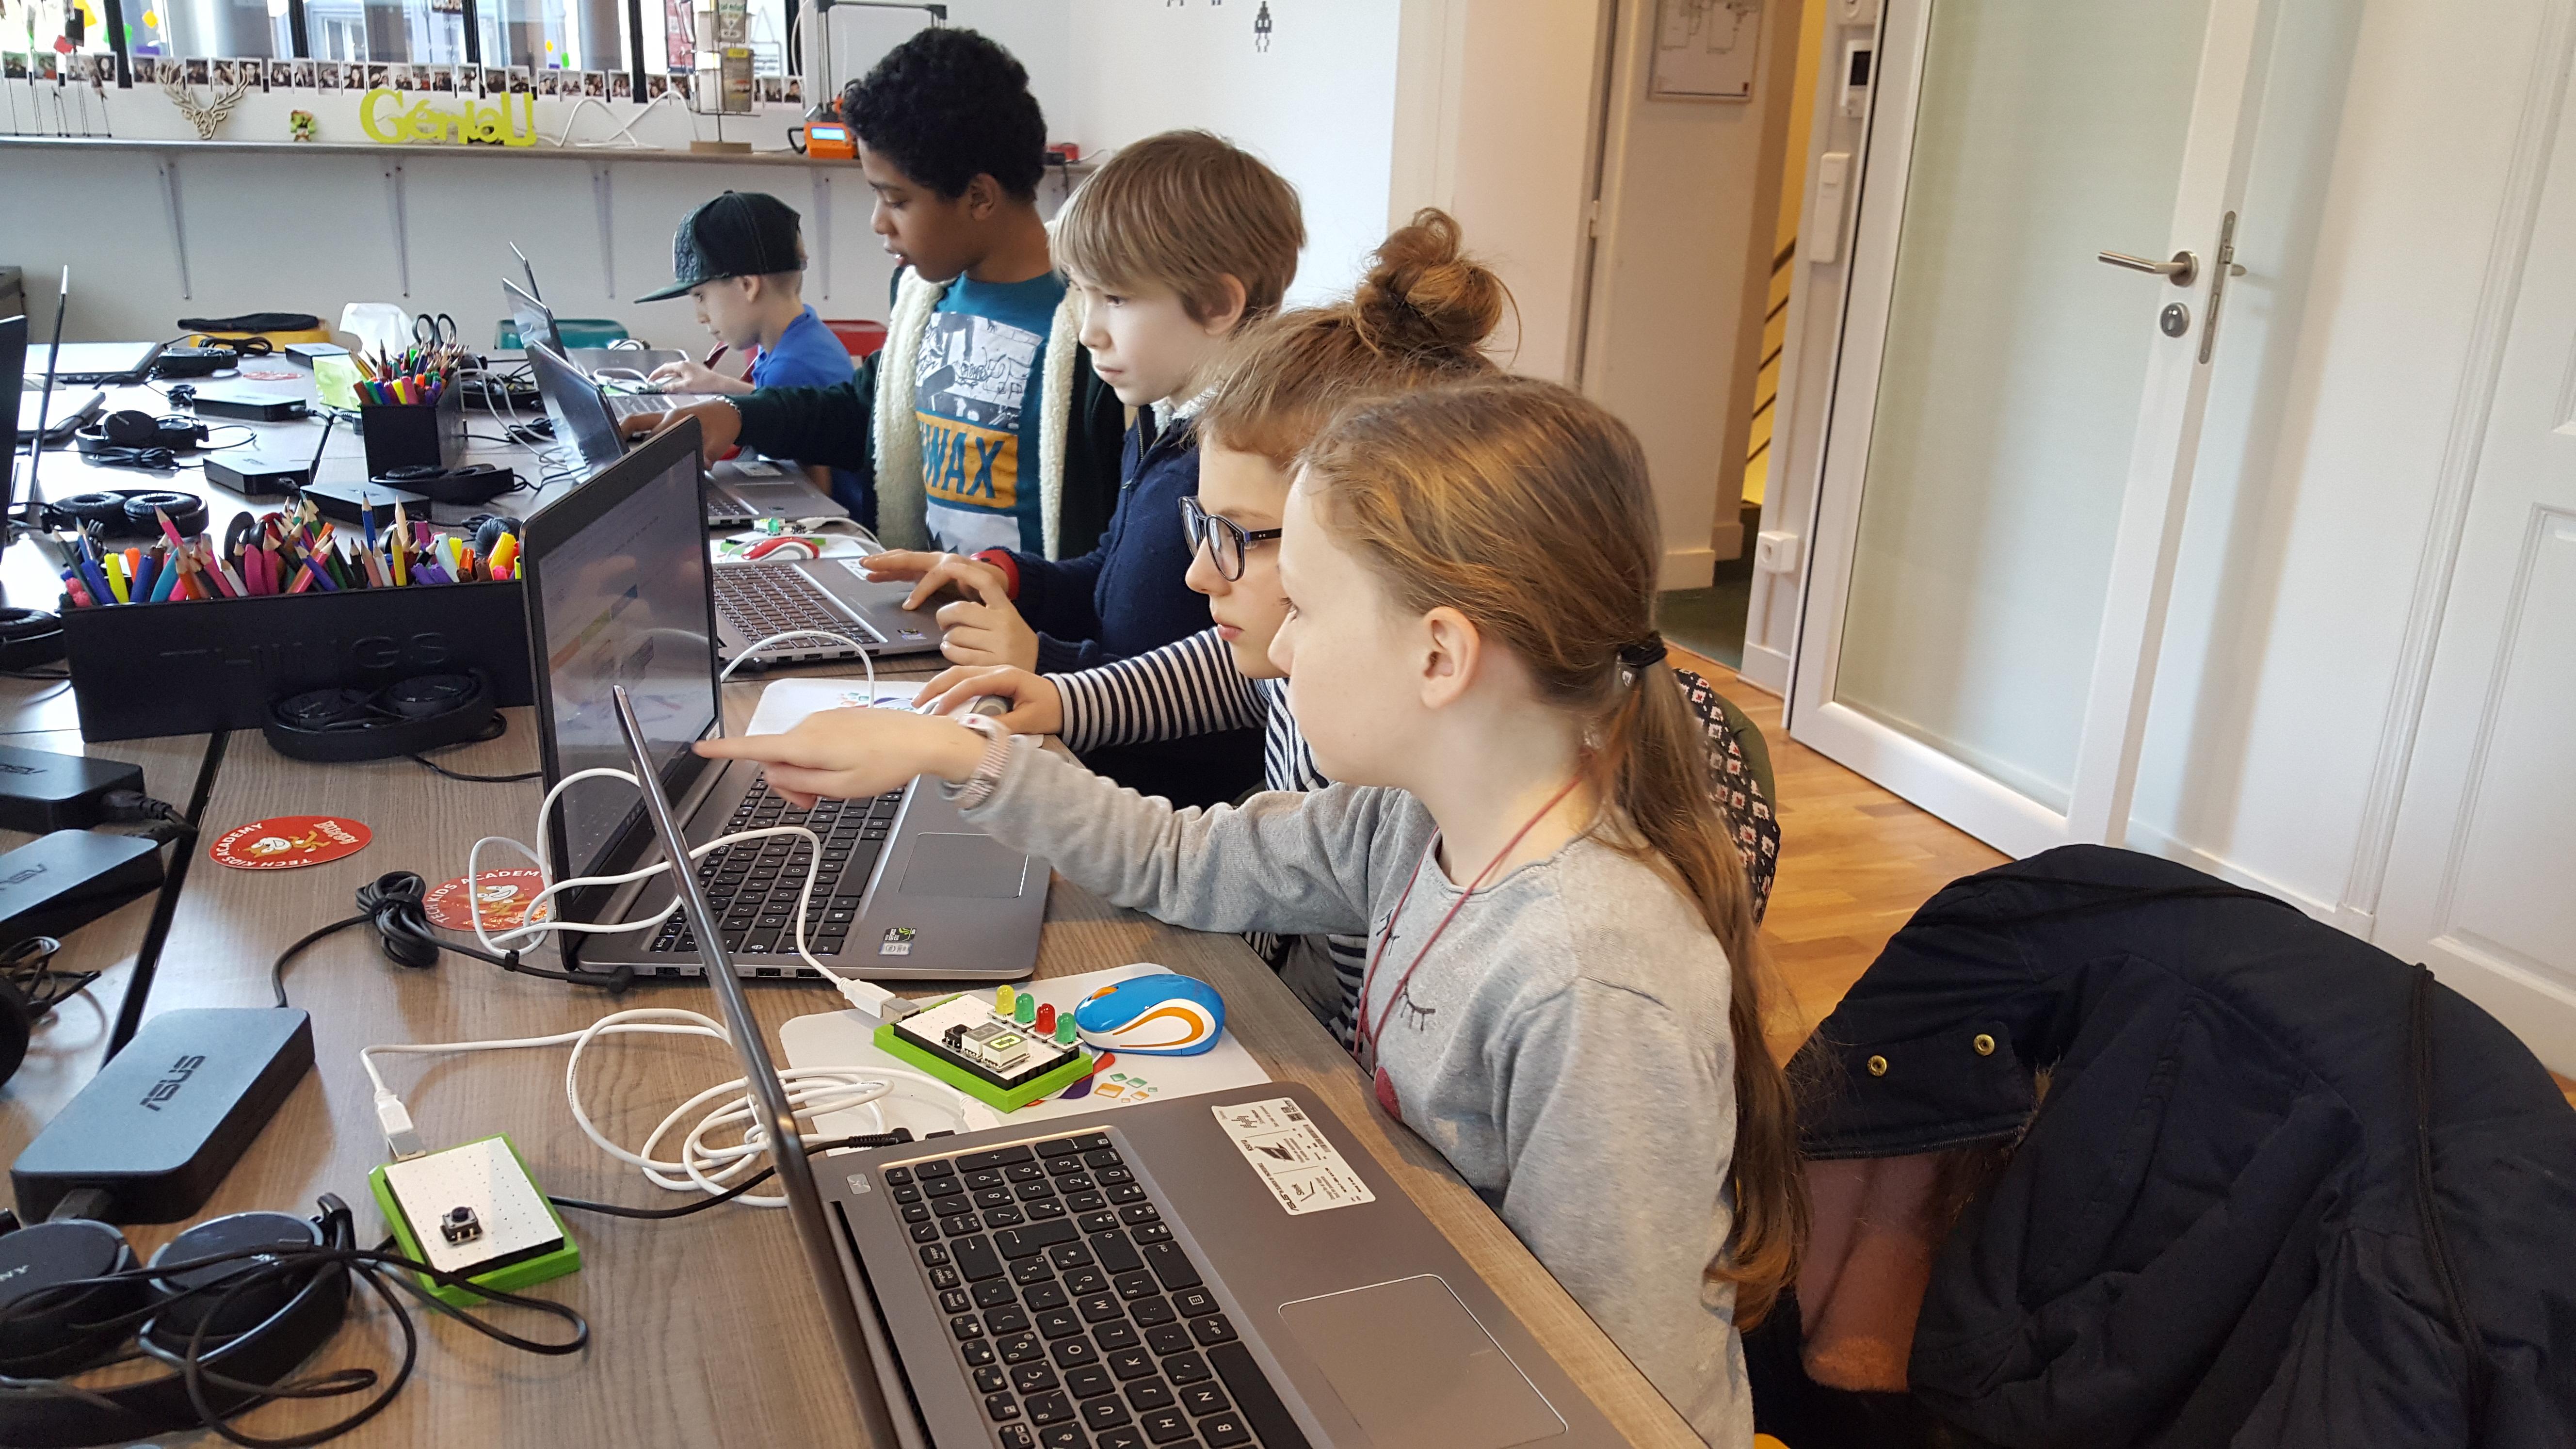 Ateliers hebdos 10-12 groupe enfants